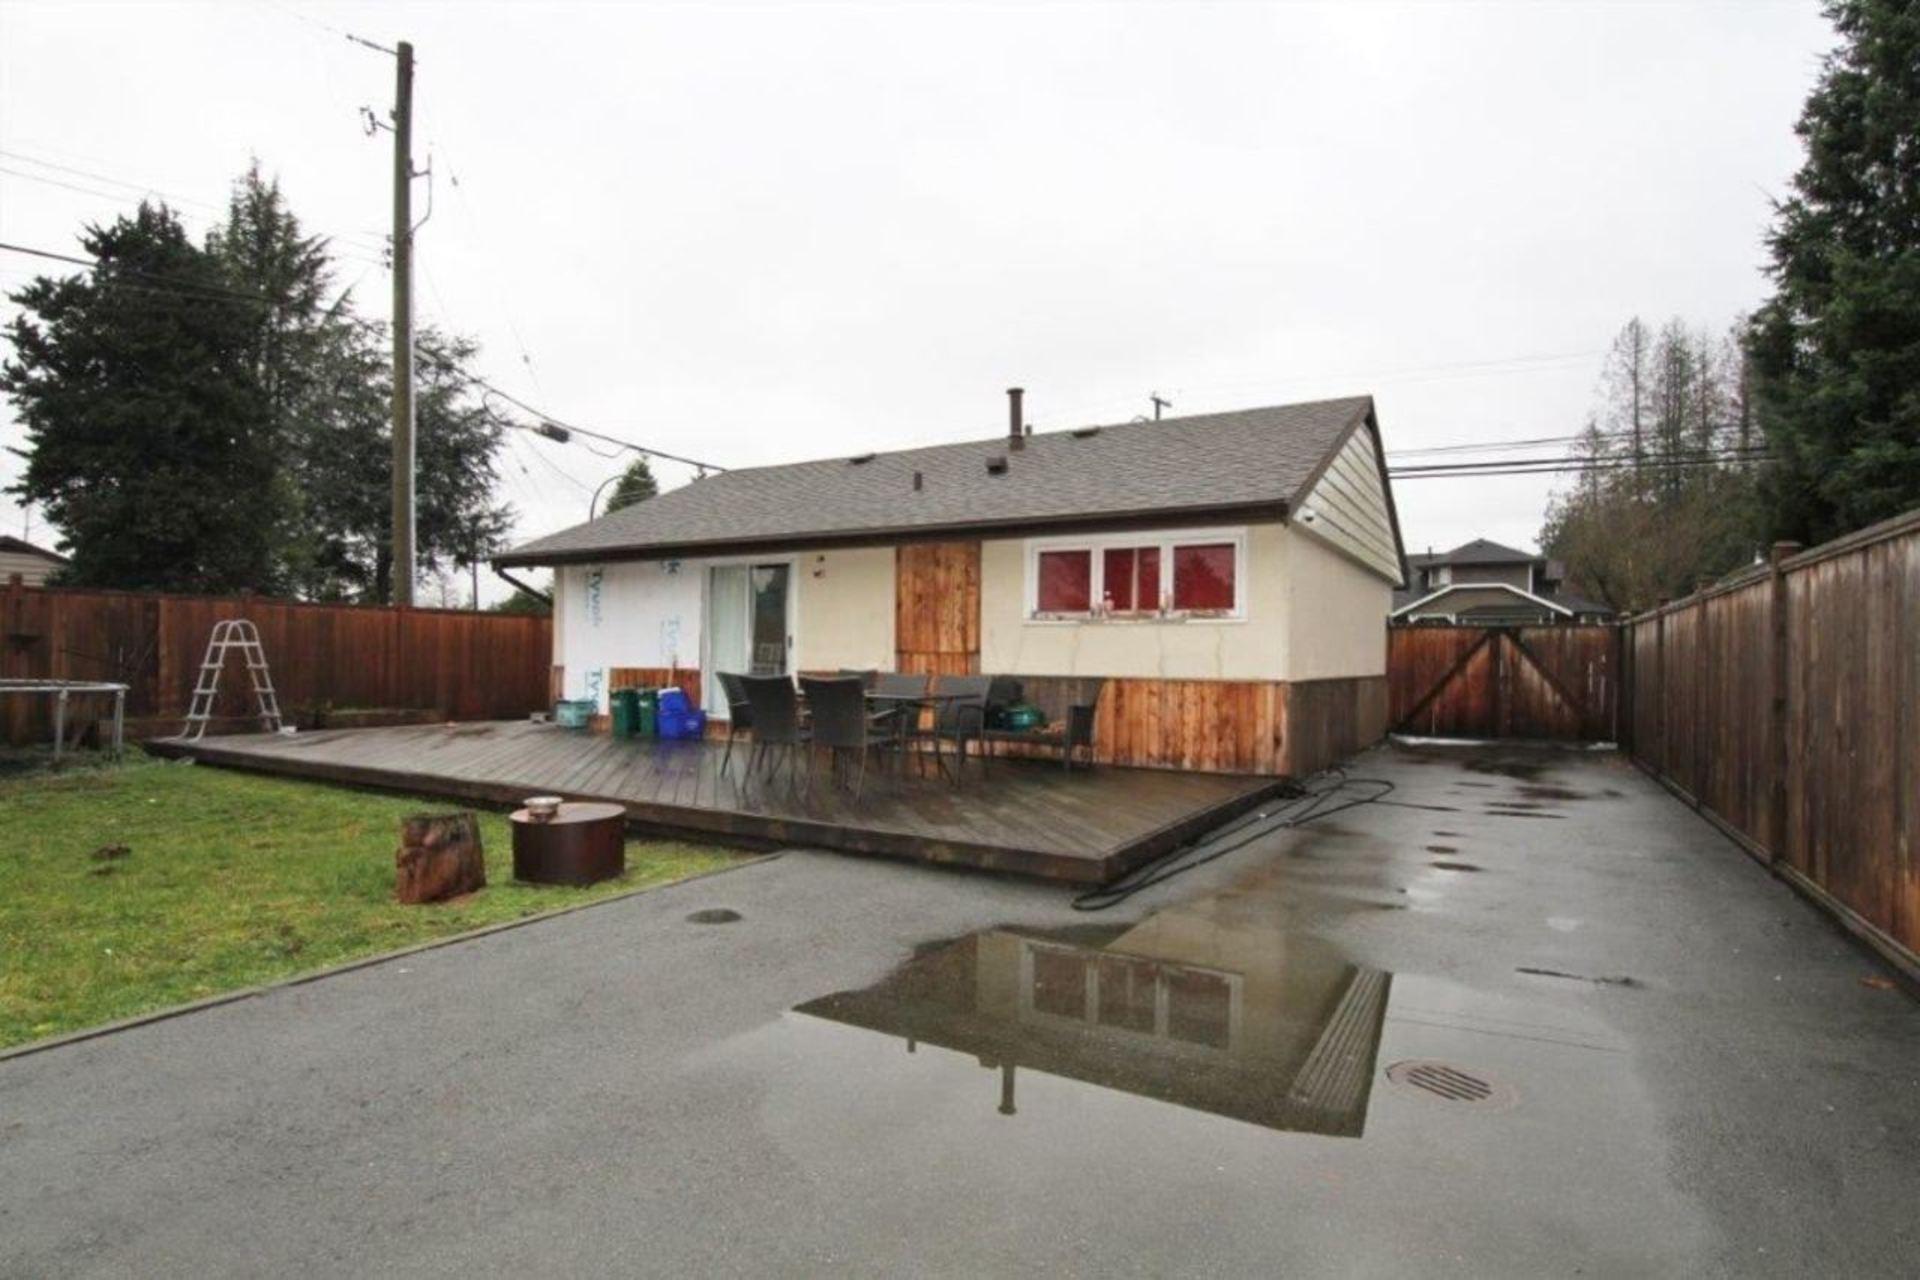 12351-203-street-west-central-maple-ridge-16 at 12351 203 Street, West Central, Maple Ridge